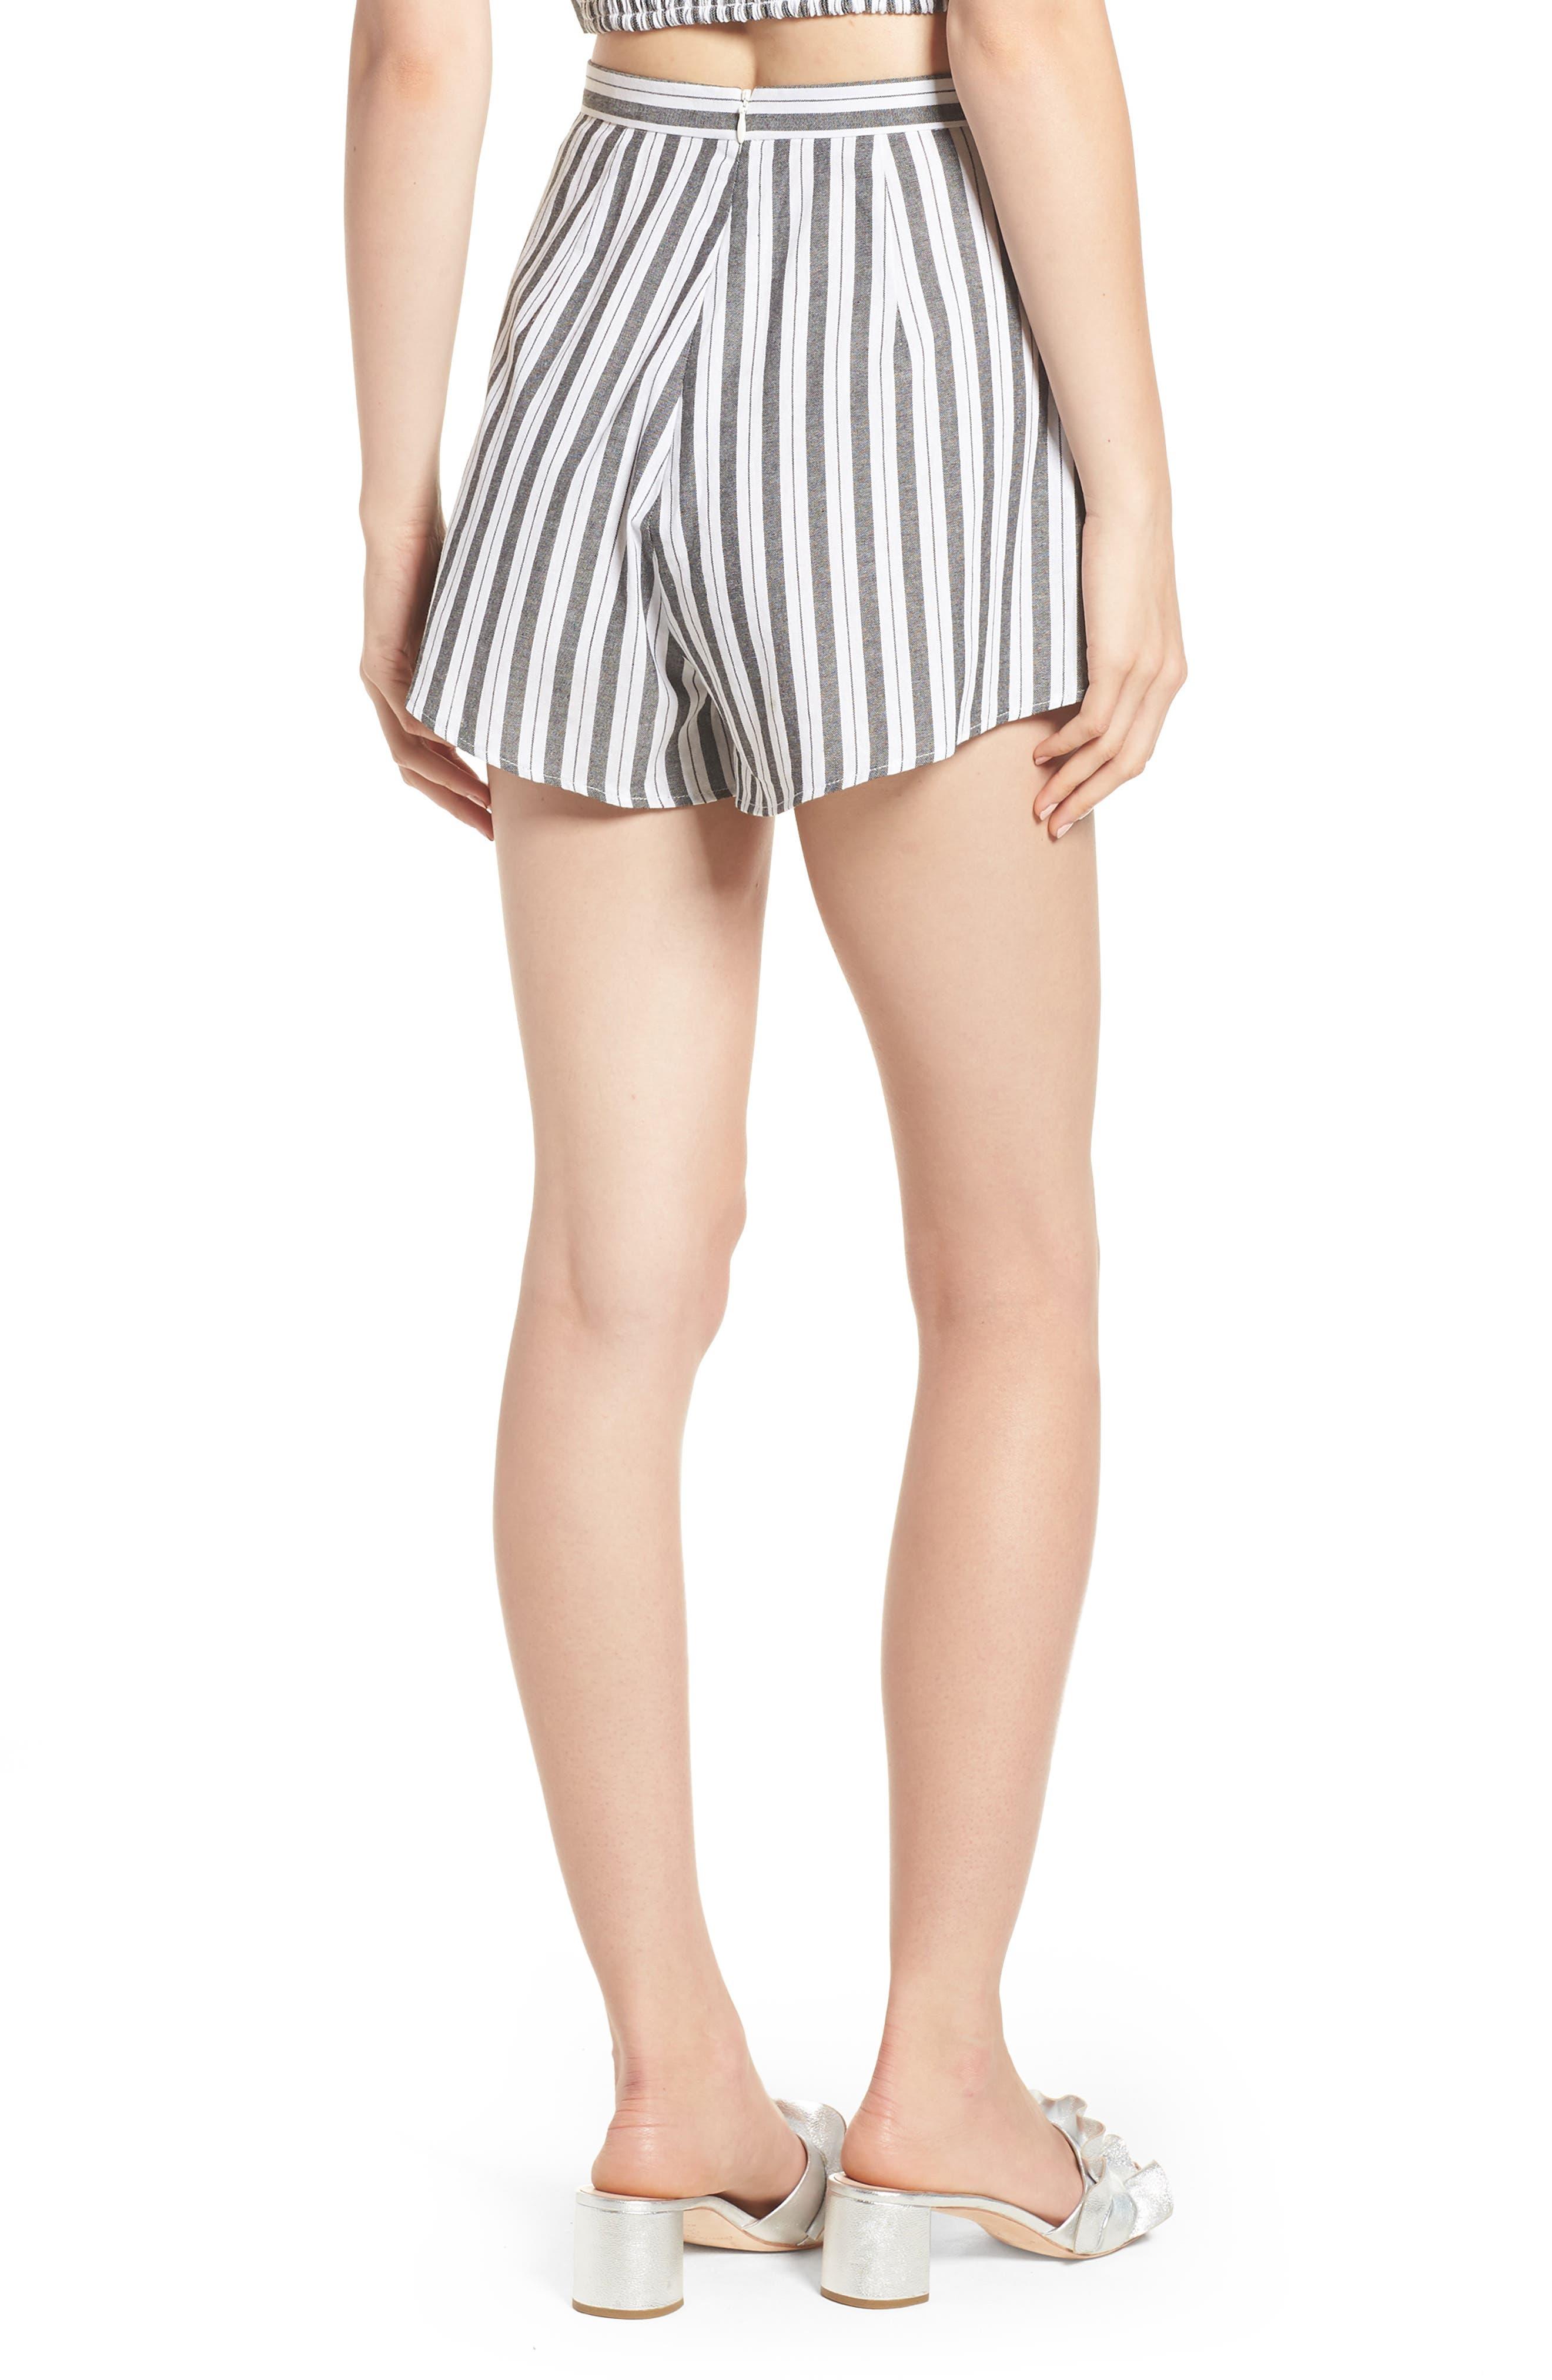 Acacia Stripe High Waist Shorts,                             Alternate thumbnail 3, color,                             Black W White